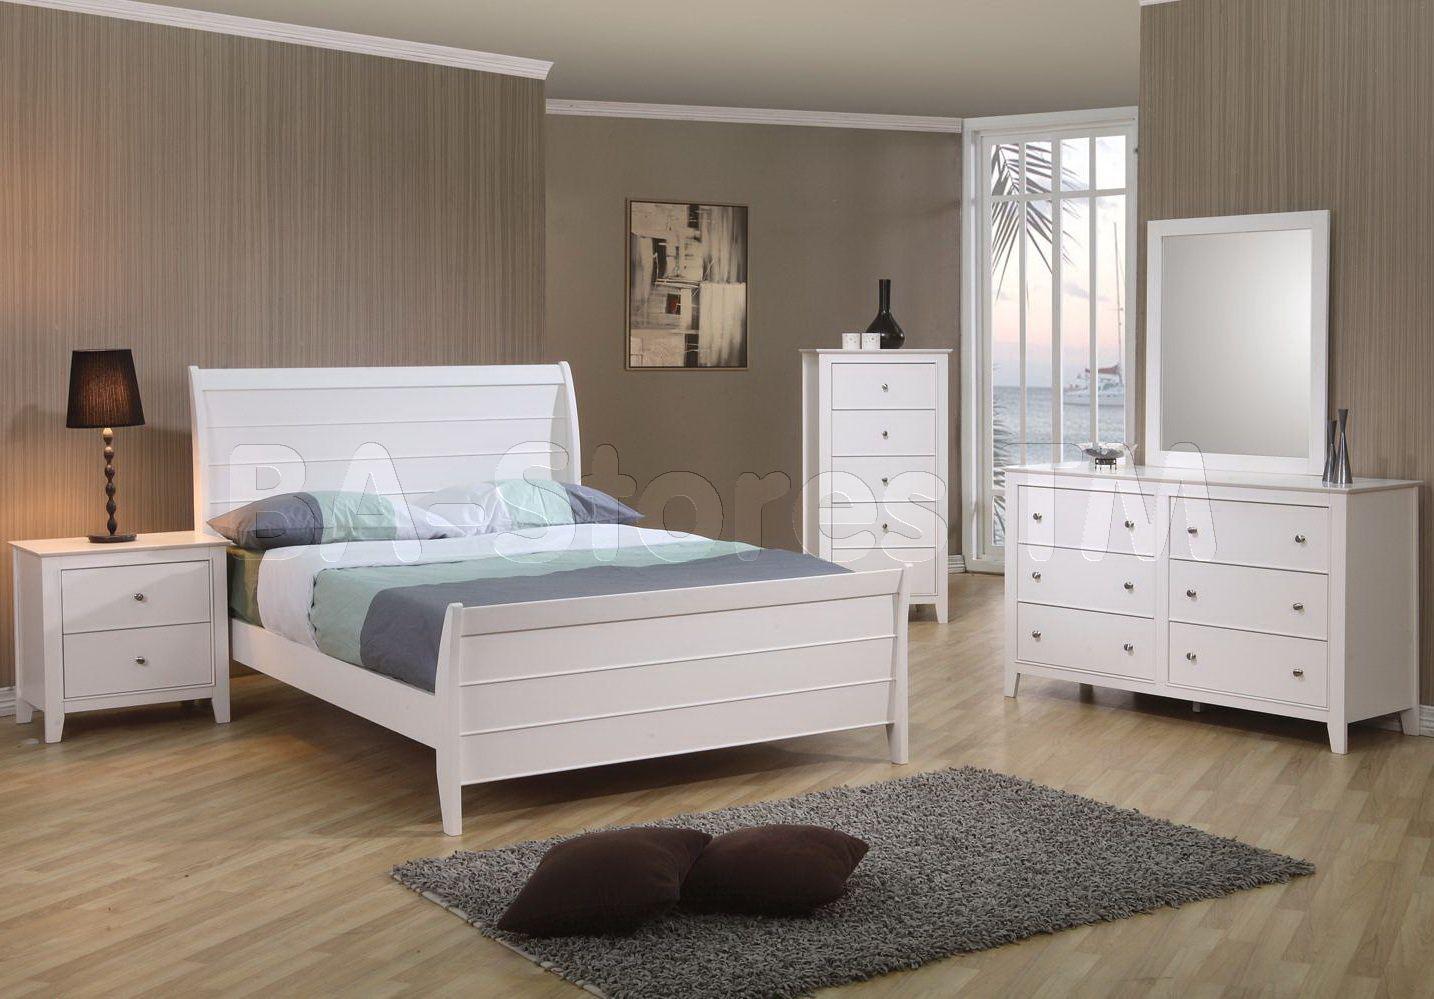 Girls full bedroom set best interior paint brands check more at